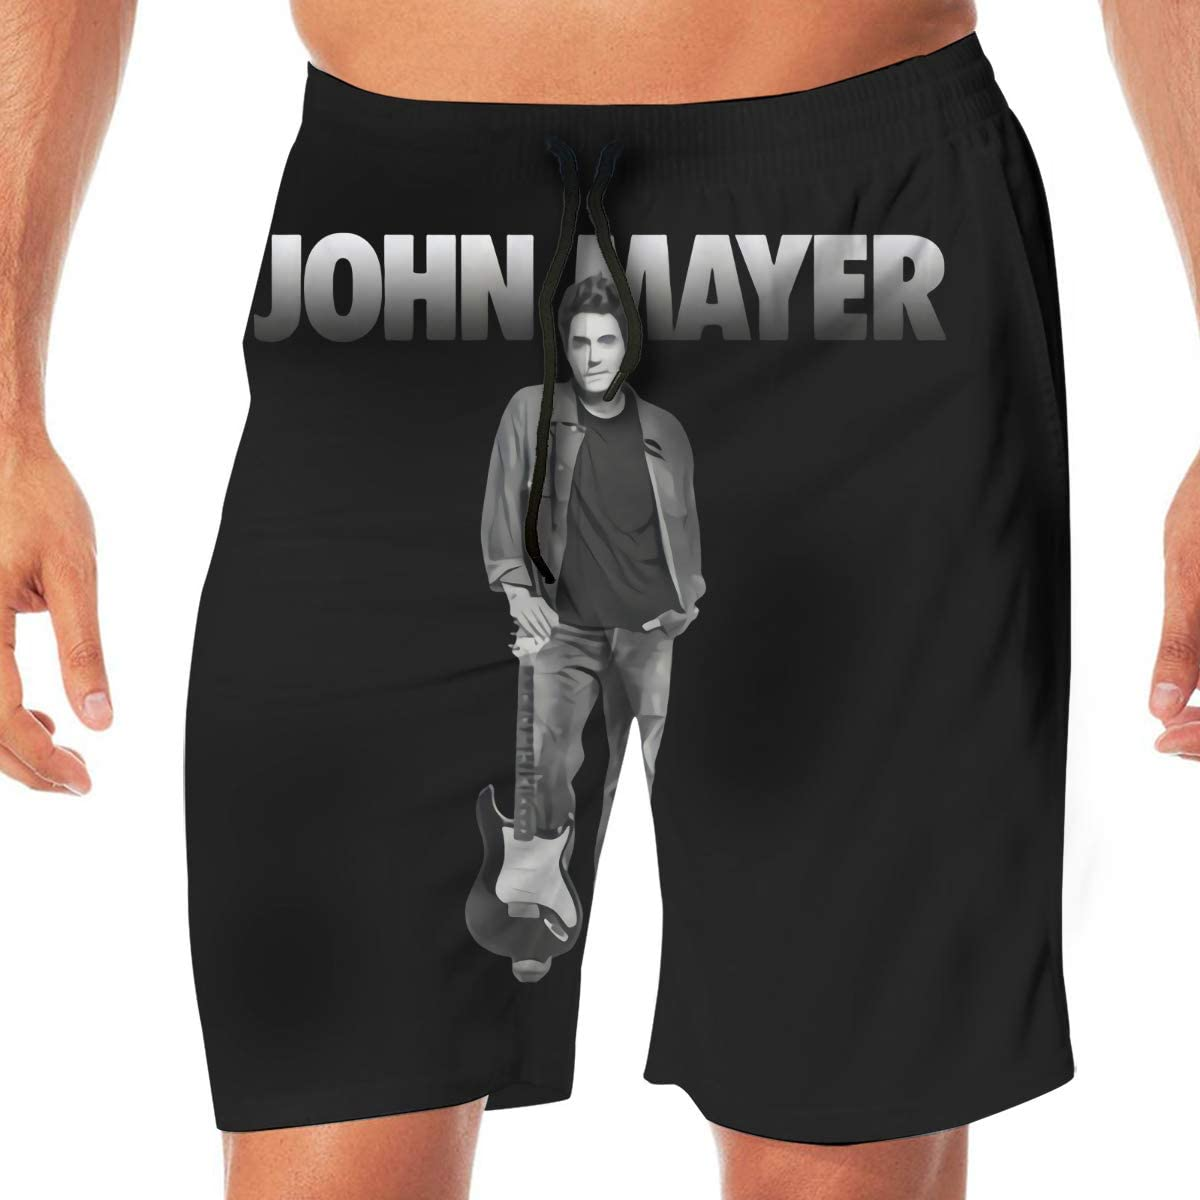 John Mayer Tour 2019 Quick DrySwim Trunks Water Shorts Swimsuit Beach Shorts